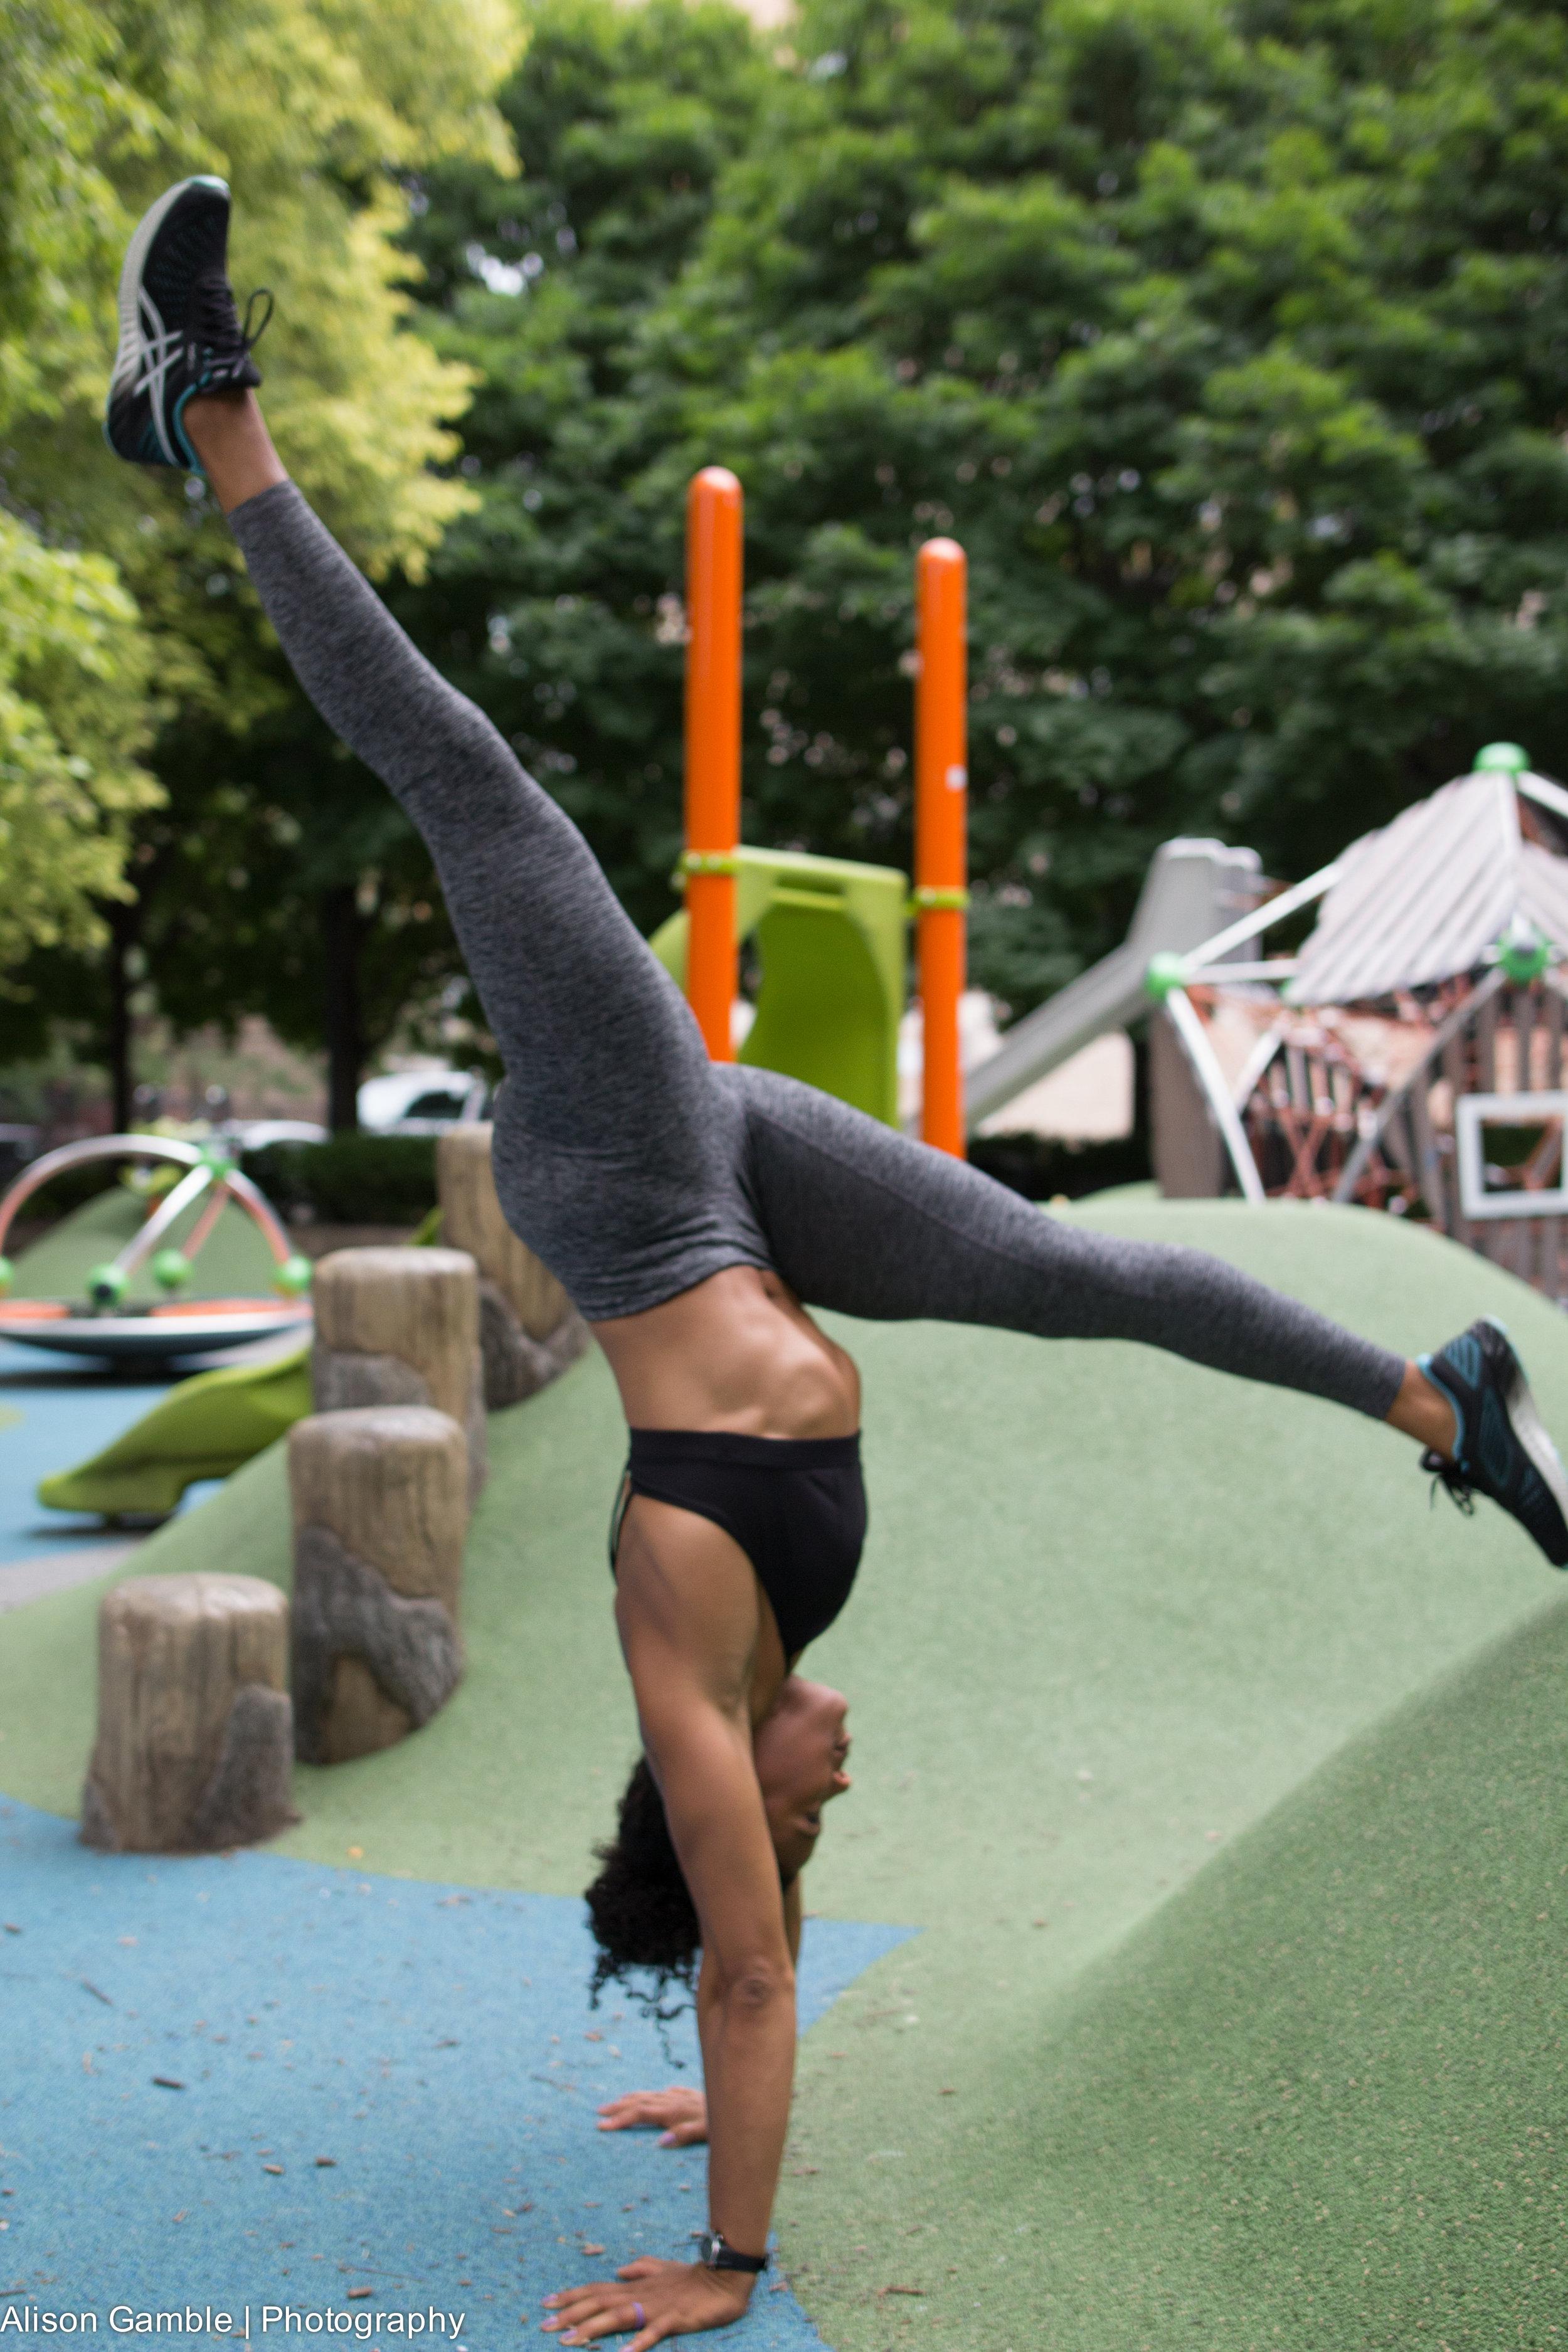 gymnastics series: handstands - click to register